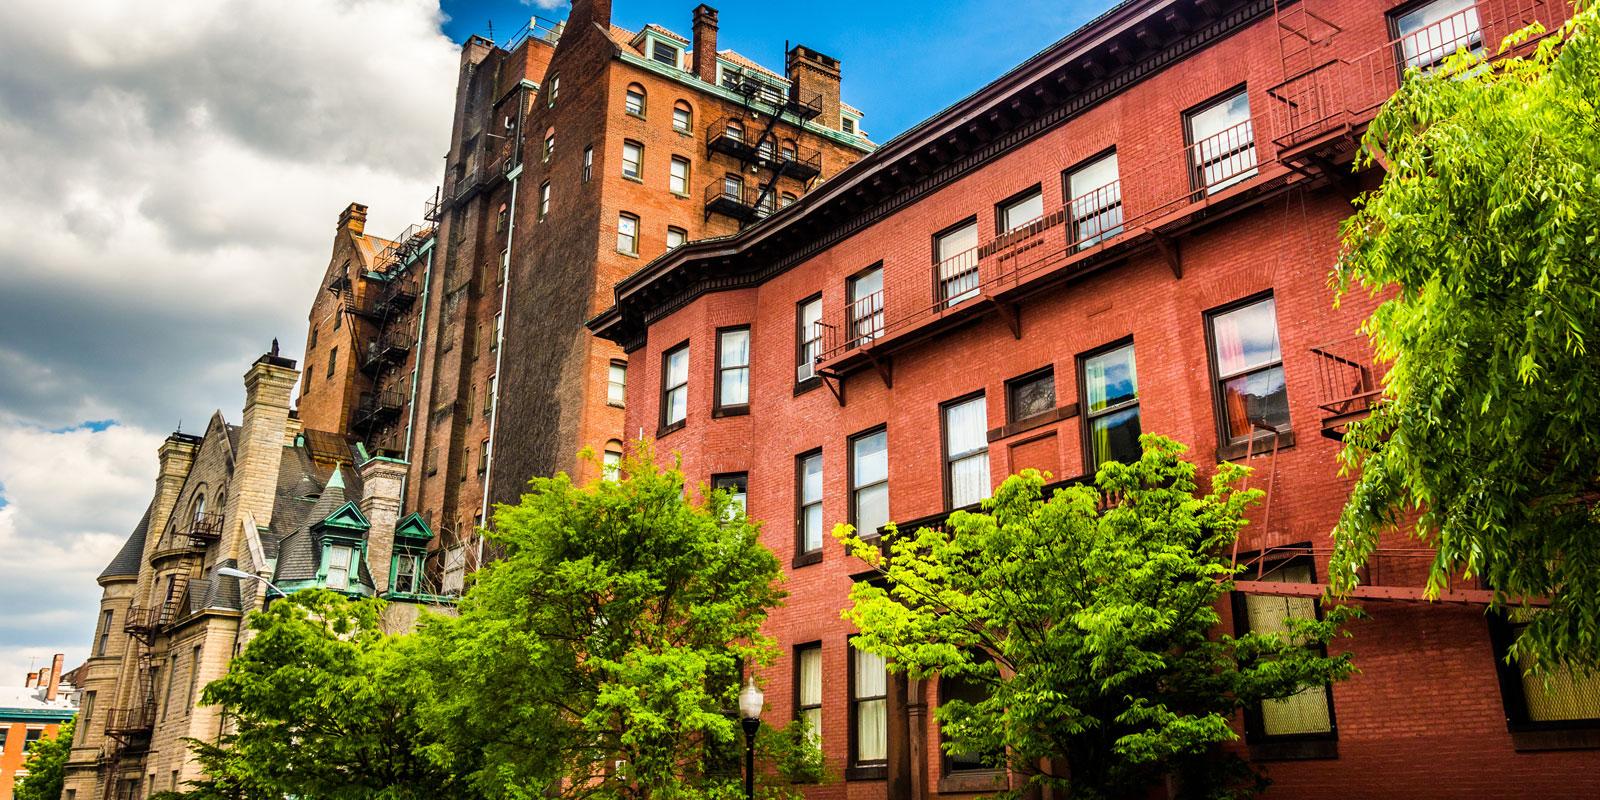 Rent furniture for your Baltimore apartment on 4WallsinBaltimore